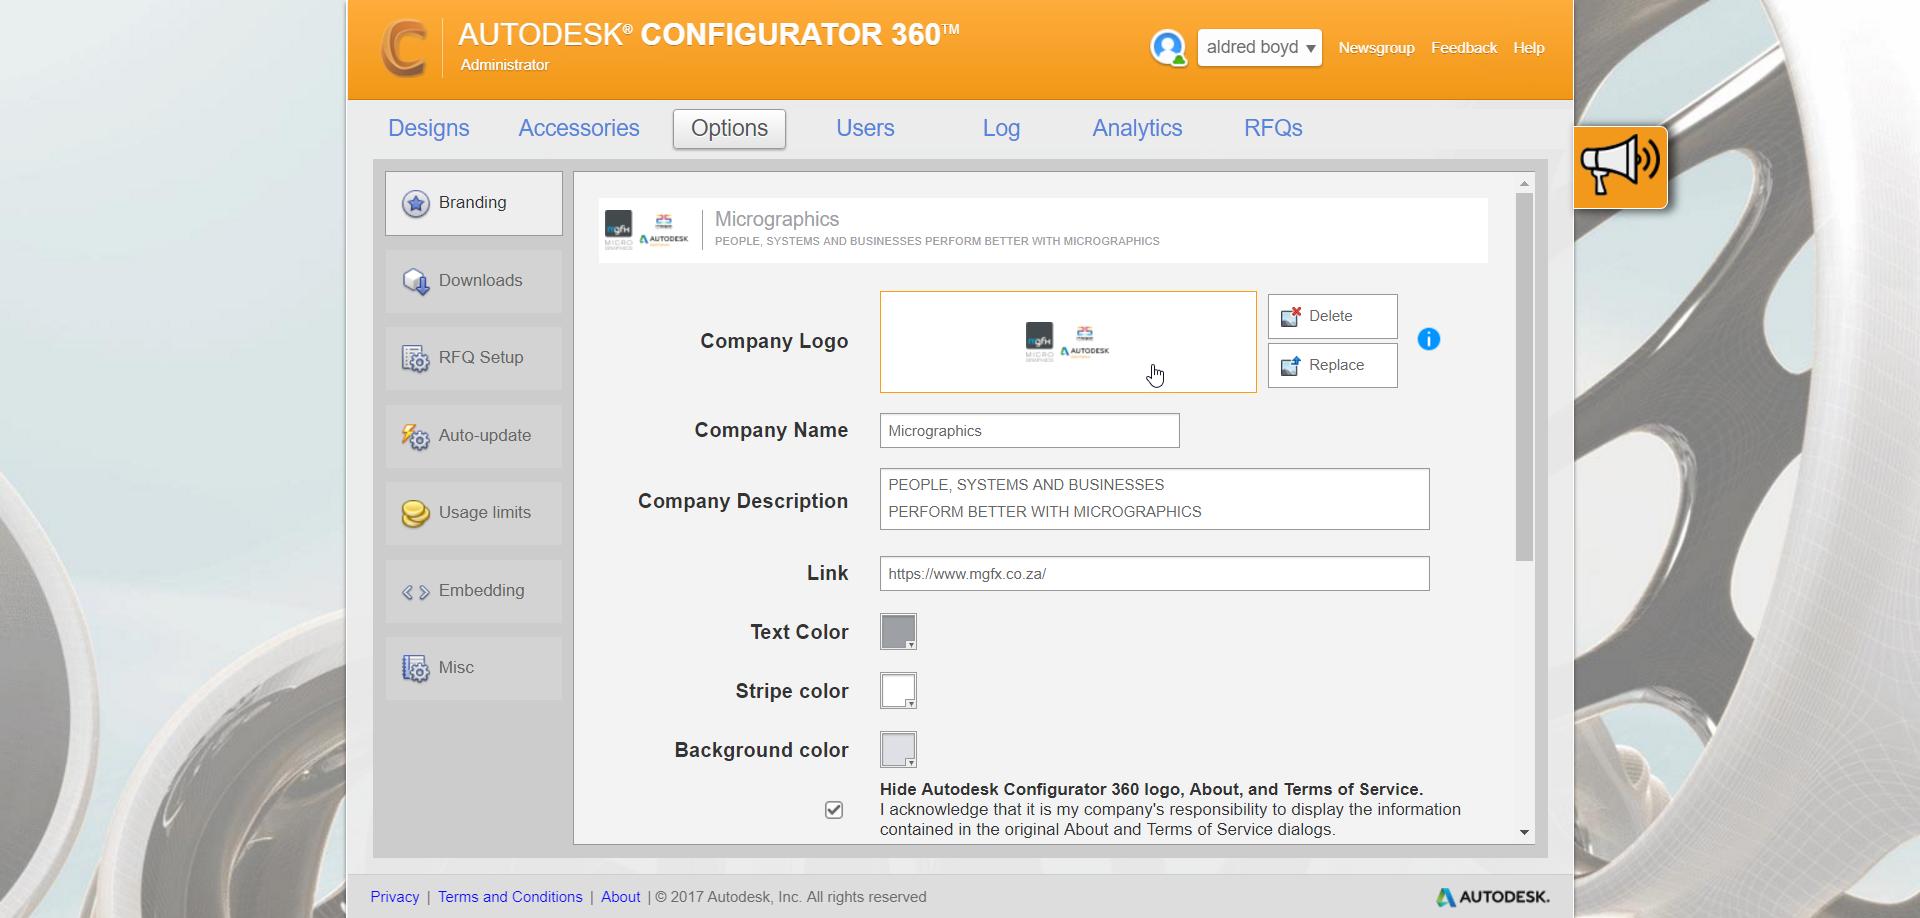 2-10 Configurator 360 - Branding and Downloading